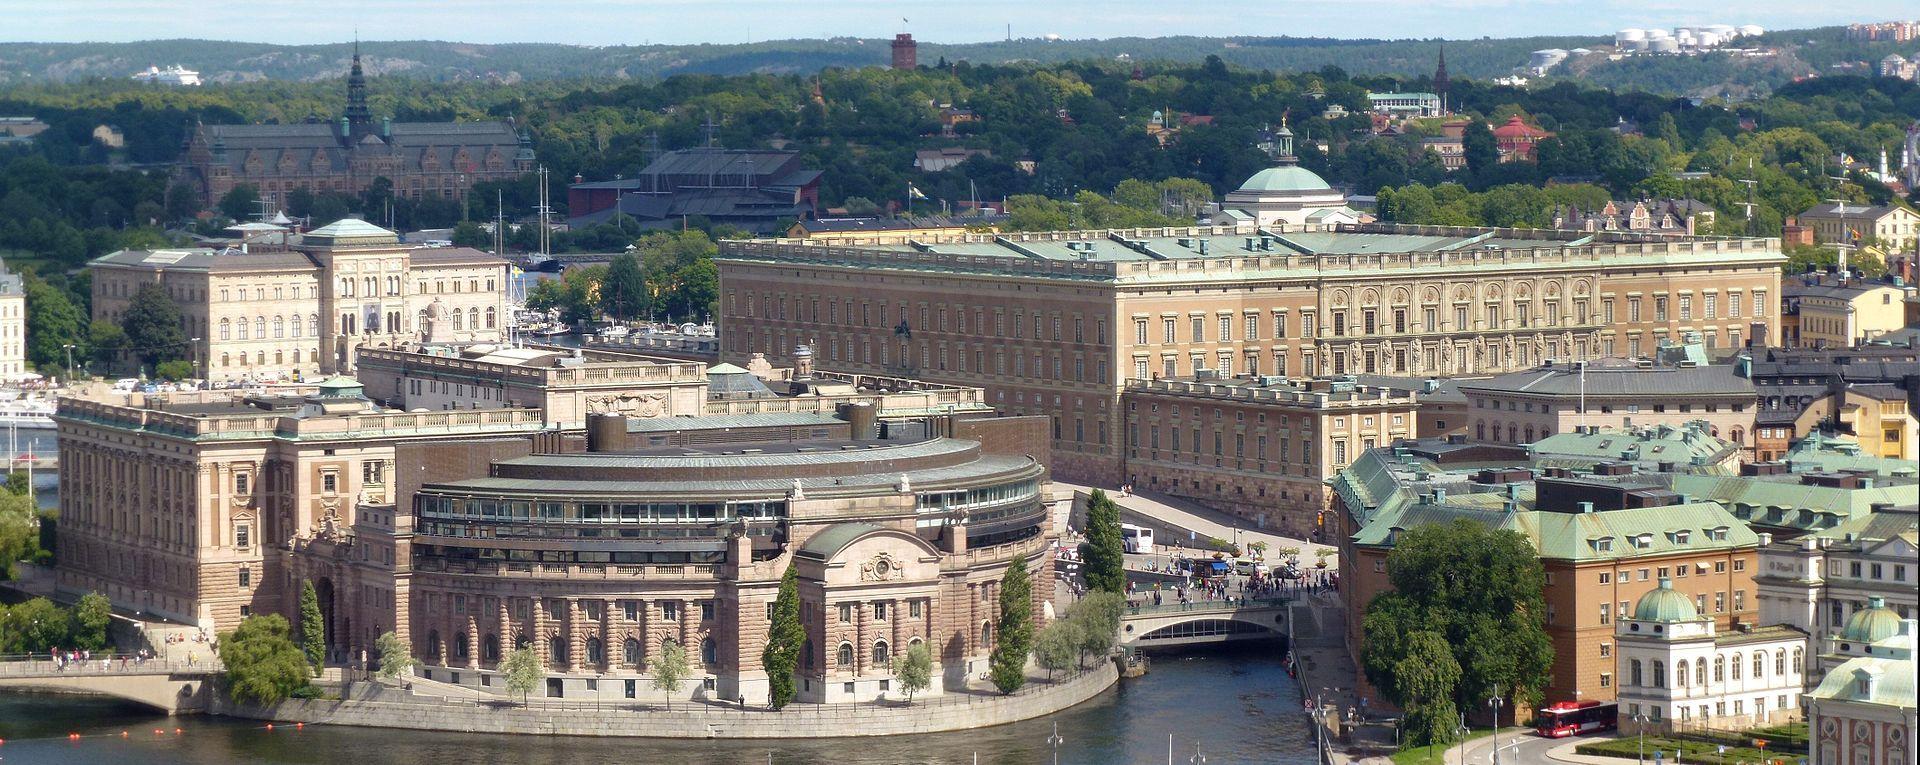 The Stockholm Palace Or The Royal Palace Swedish